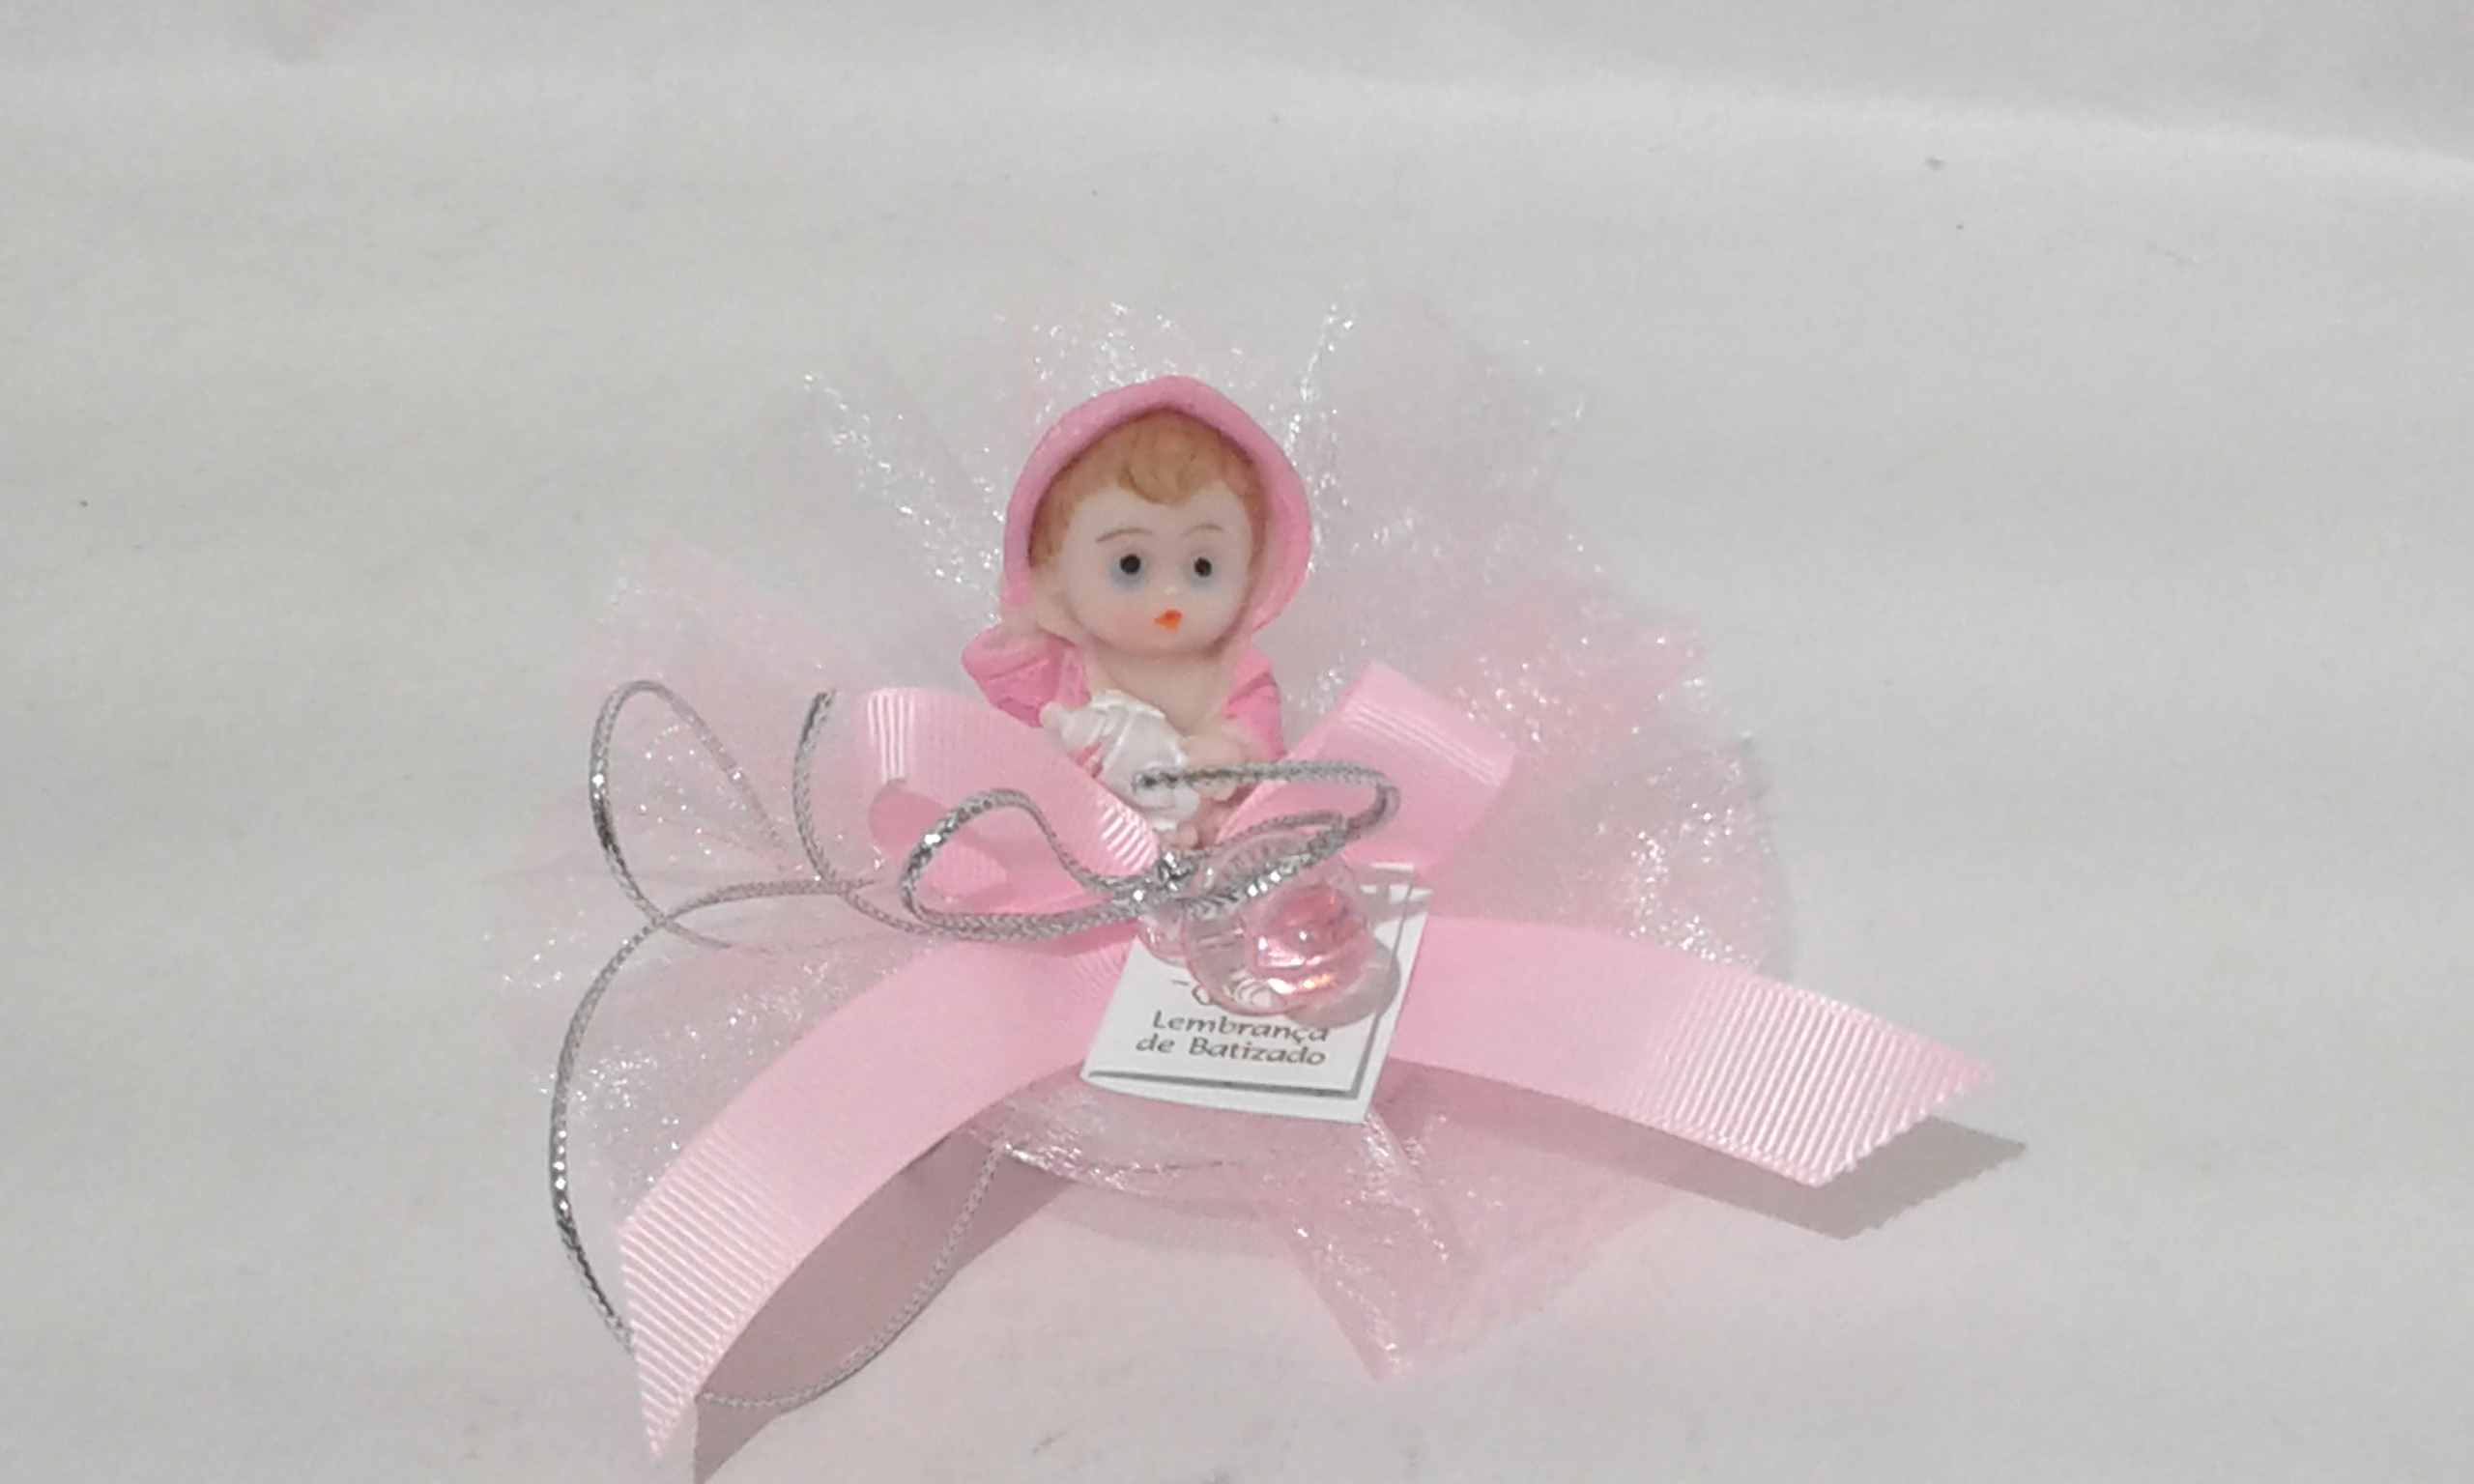 C18218 Tule com sabonete decorado bebe rosa